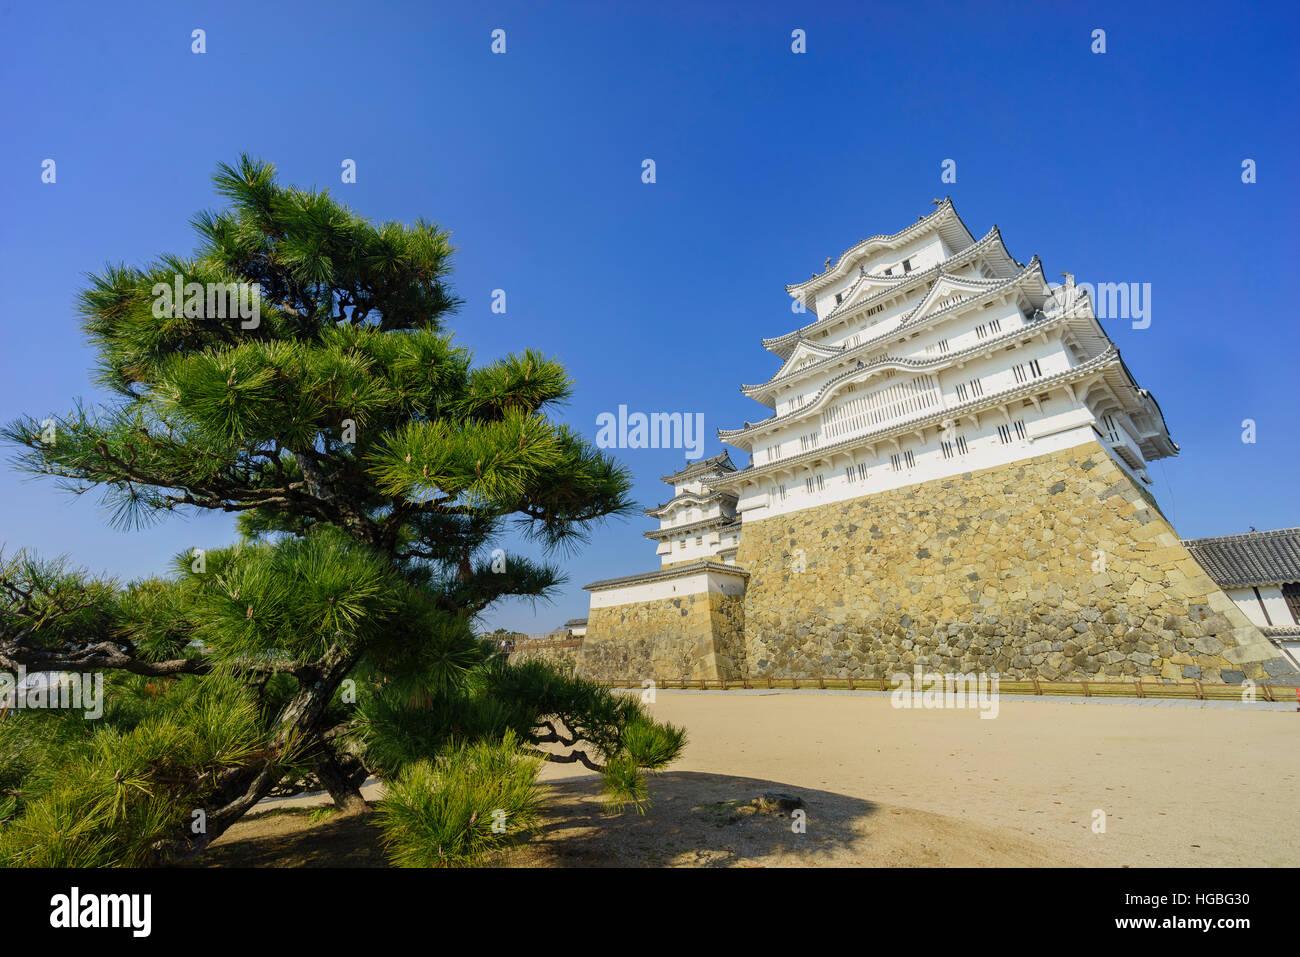 The white Heron castle - Himeji at Kobe, Japan - Stock Image